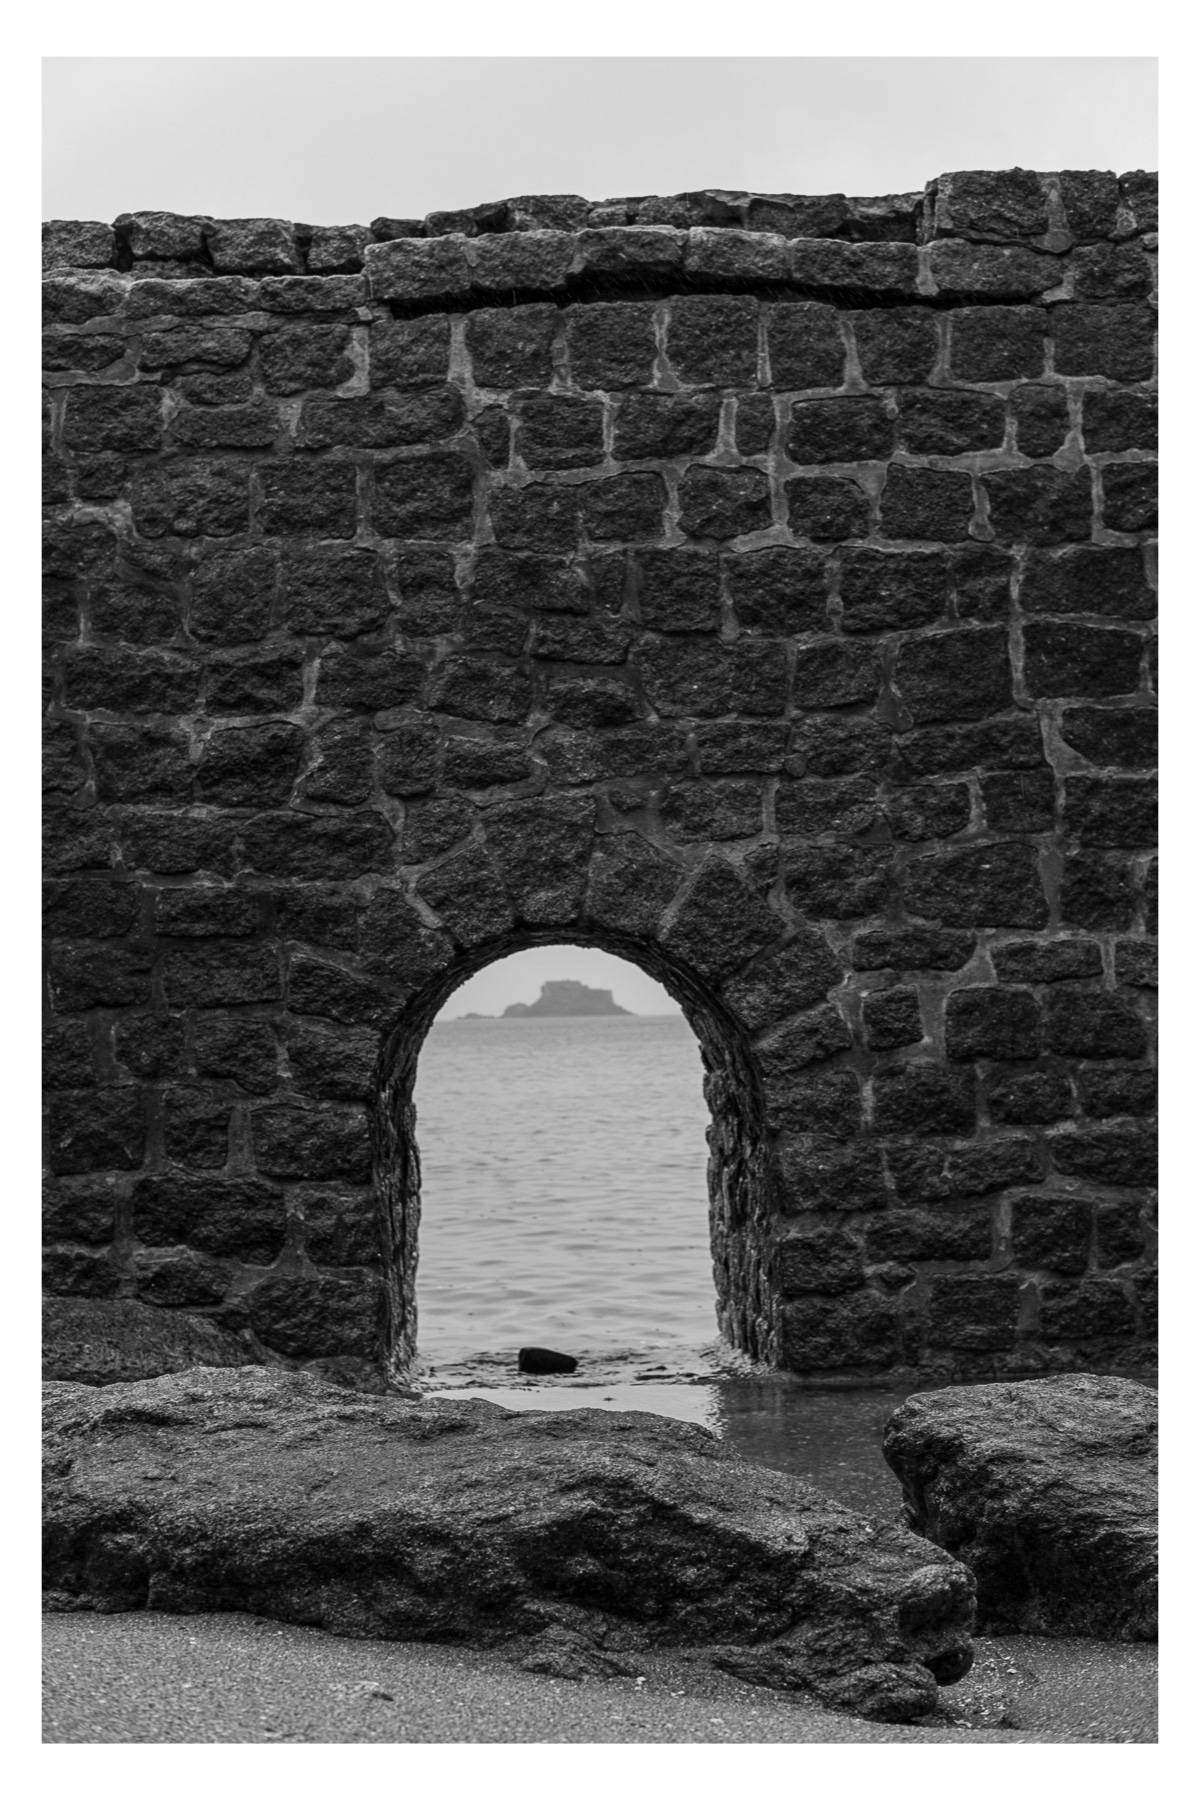 Monochrome photo of Fort de Harbour island framed by the Chemin de Ronde de la Malouine in Dinard France